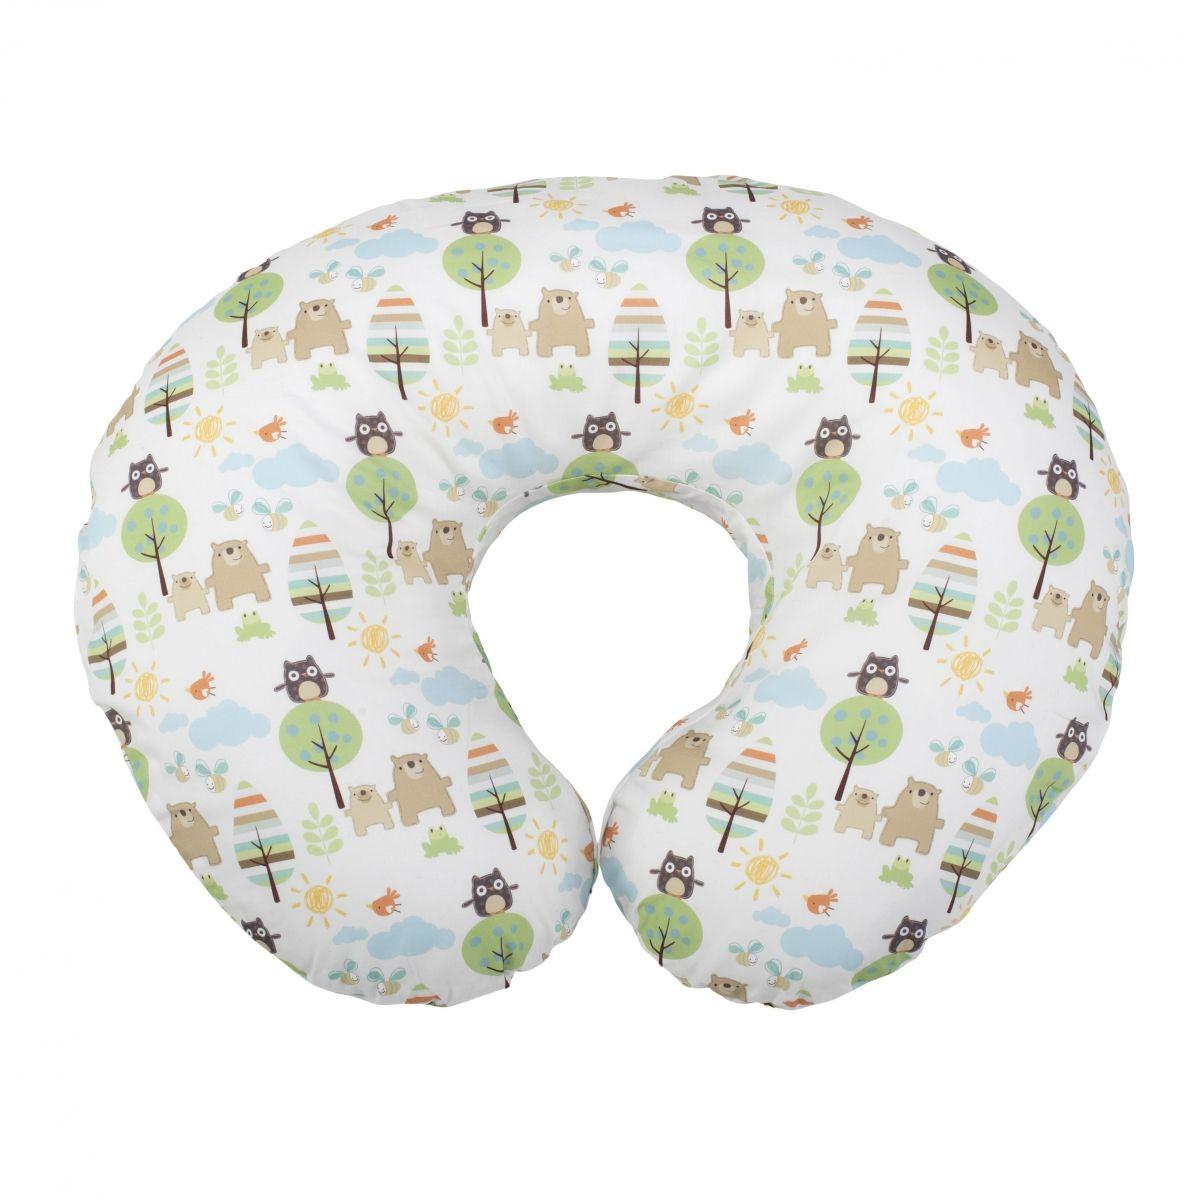 chicco Подушка для кормления Chicco Boppy Pillow 32